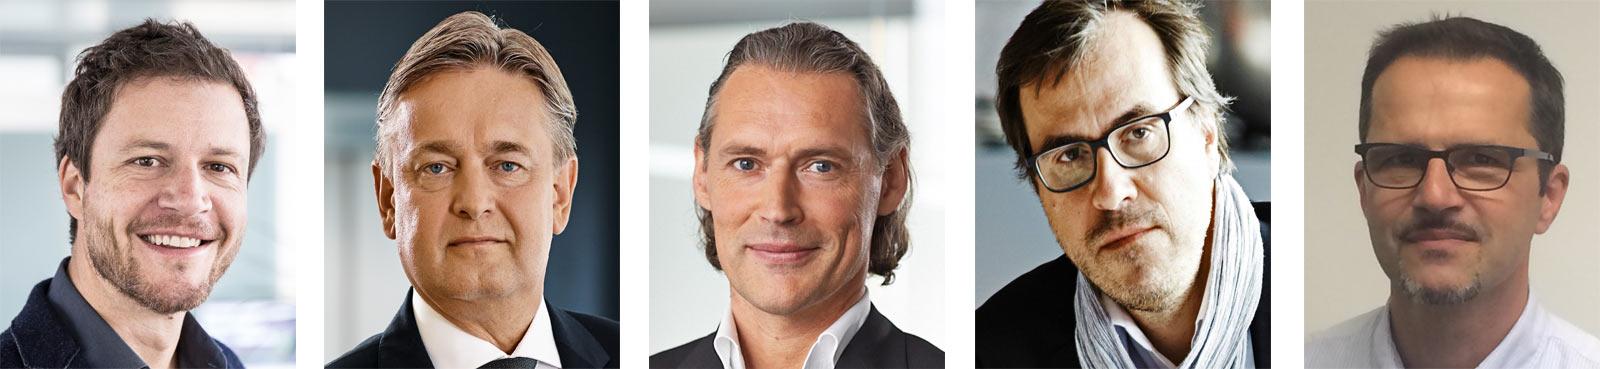 v.l.: Paul Ohnmacht, Dario Travas, Klaus Schmidt, Florian Beck, Christoph Schmid